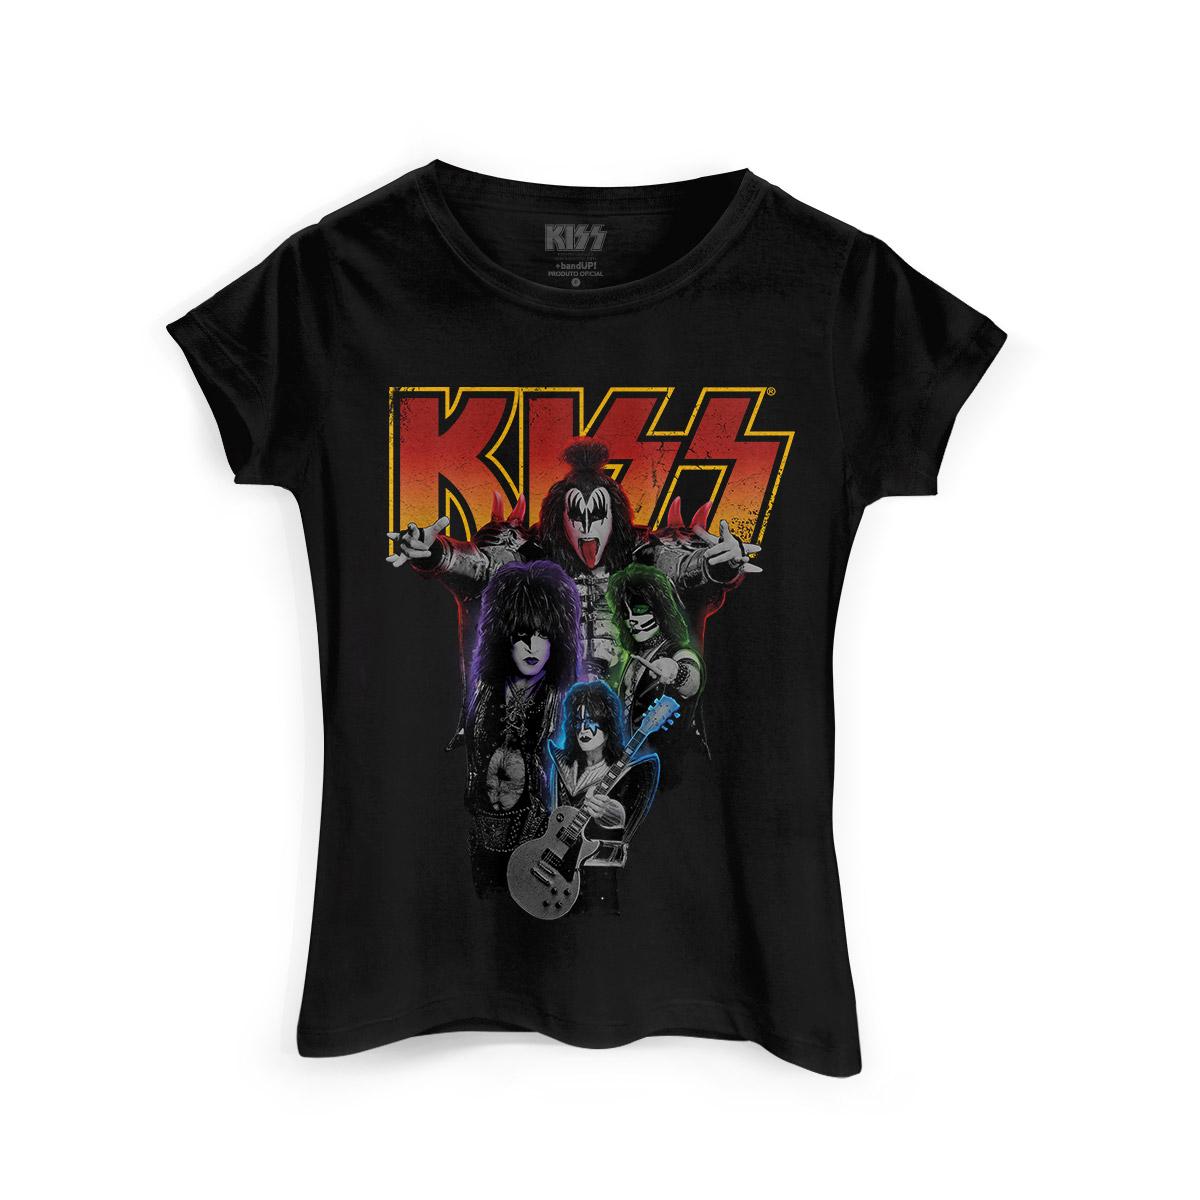 Camiseta Feminina Kiss Kissology  - bandUP Store Marketplace